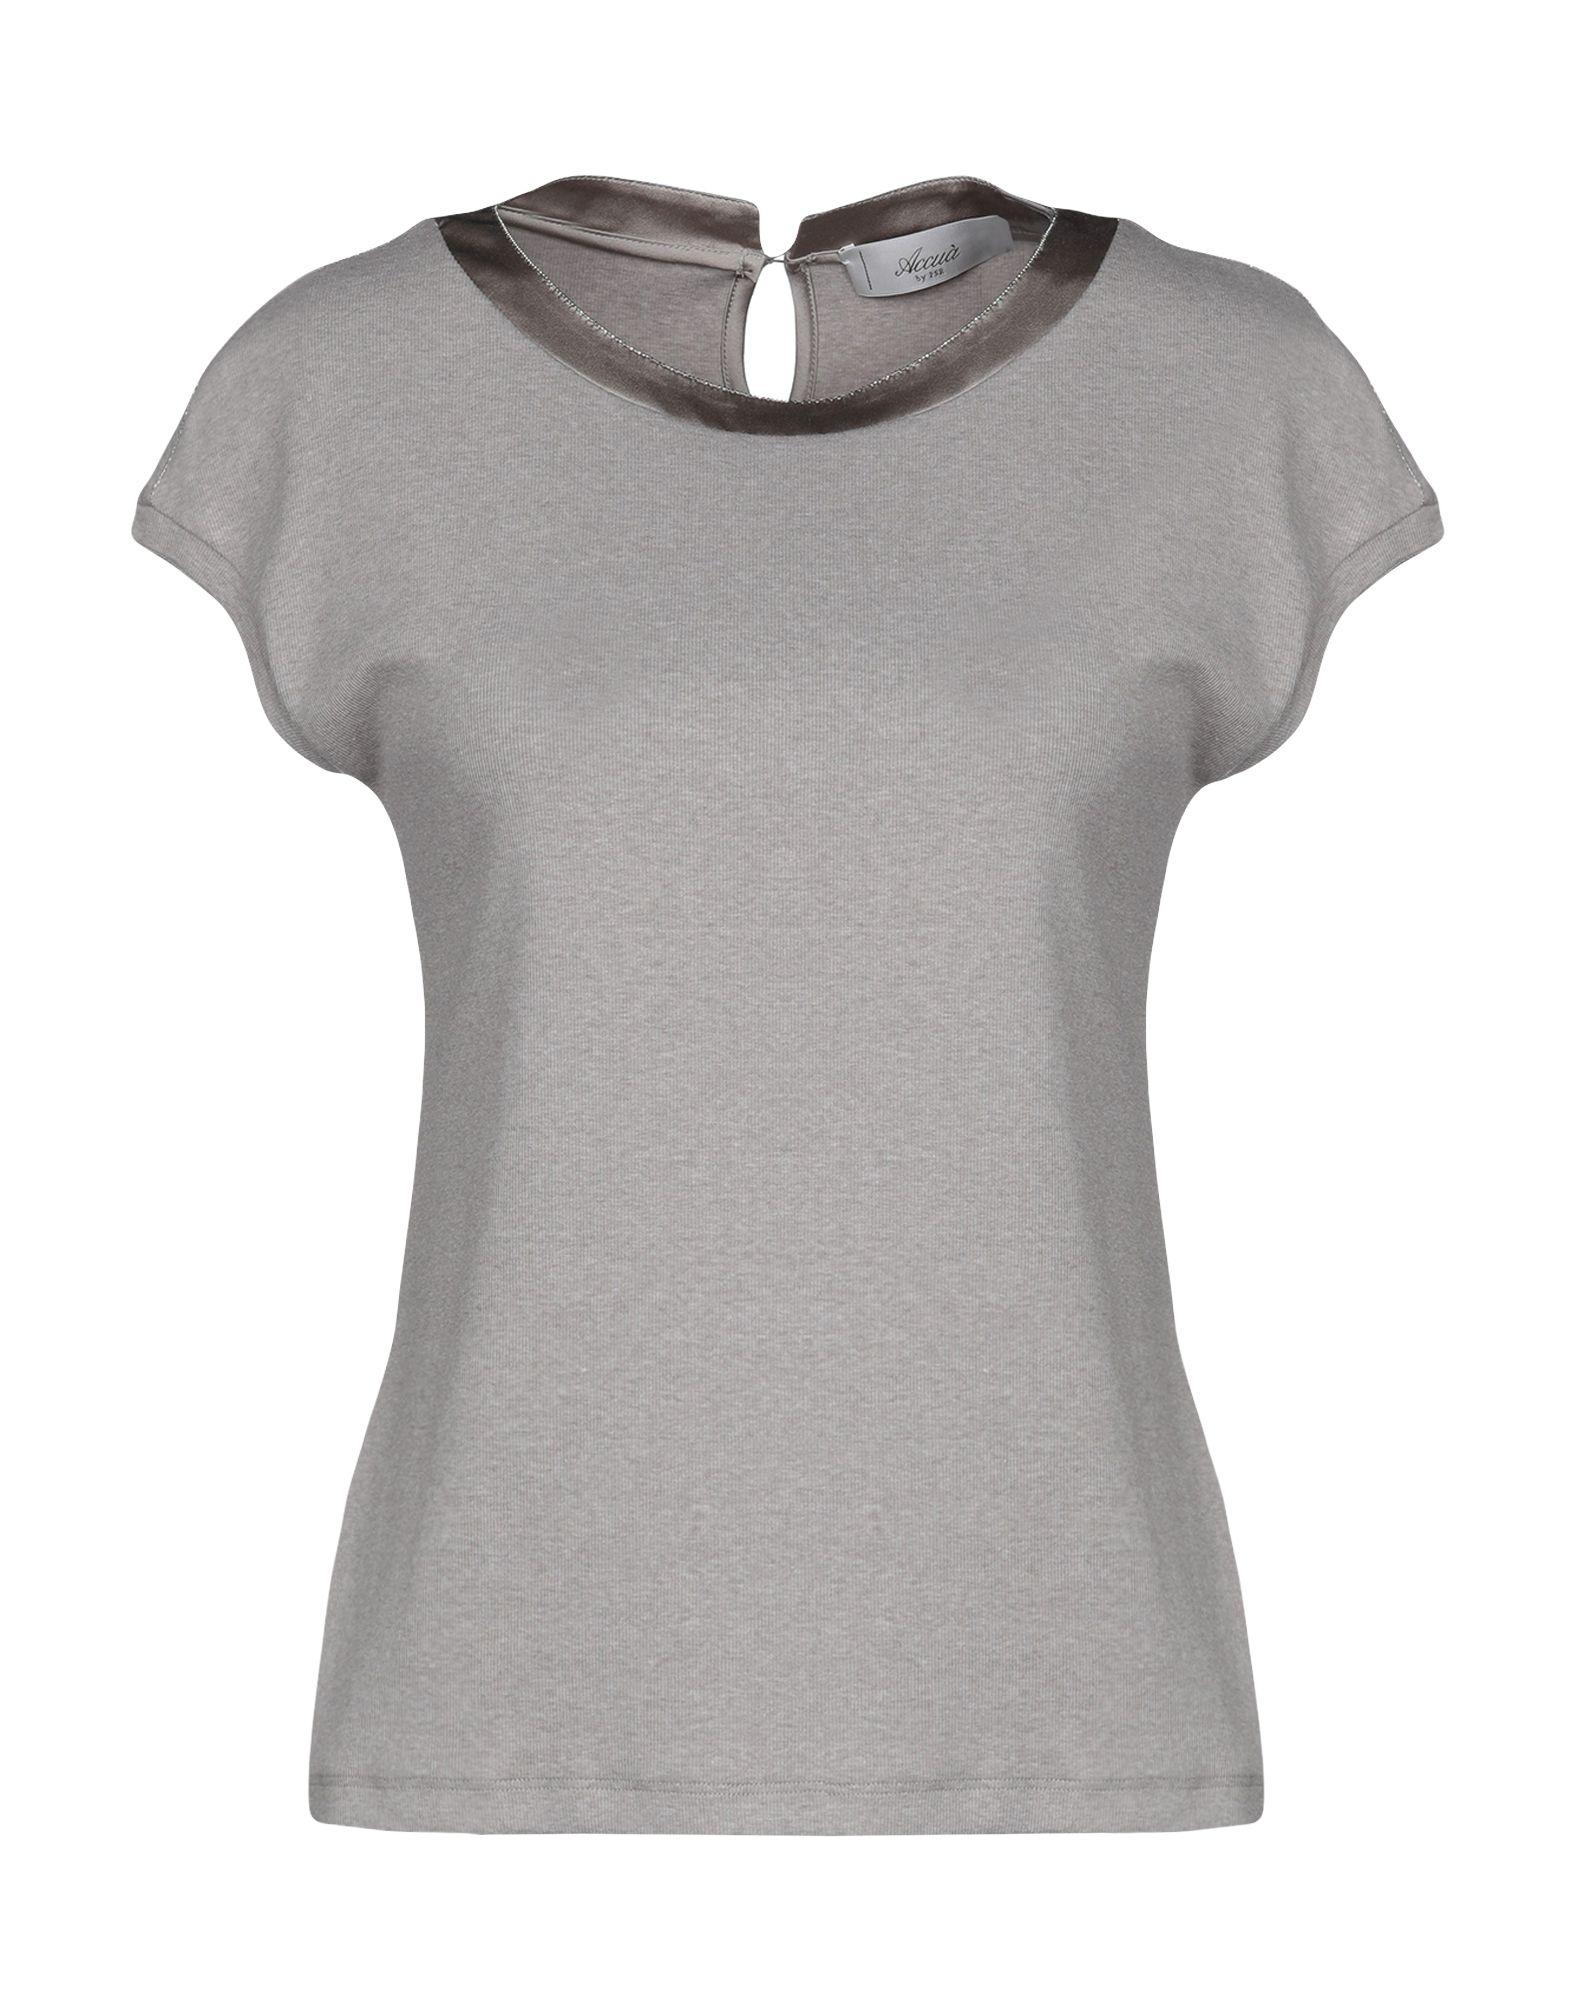 T-Shirt Accuà By Psr damen - 12250953QS